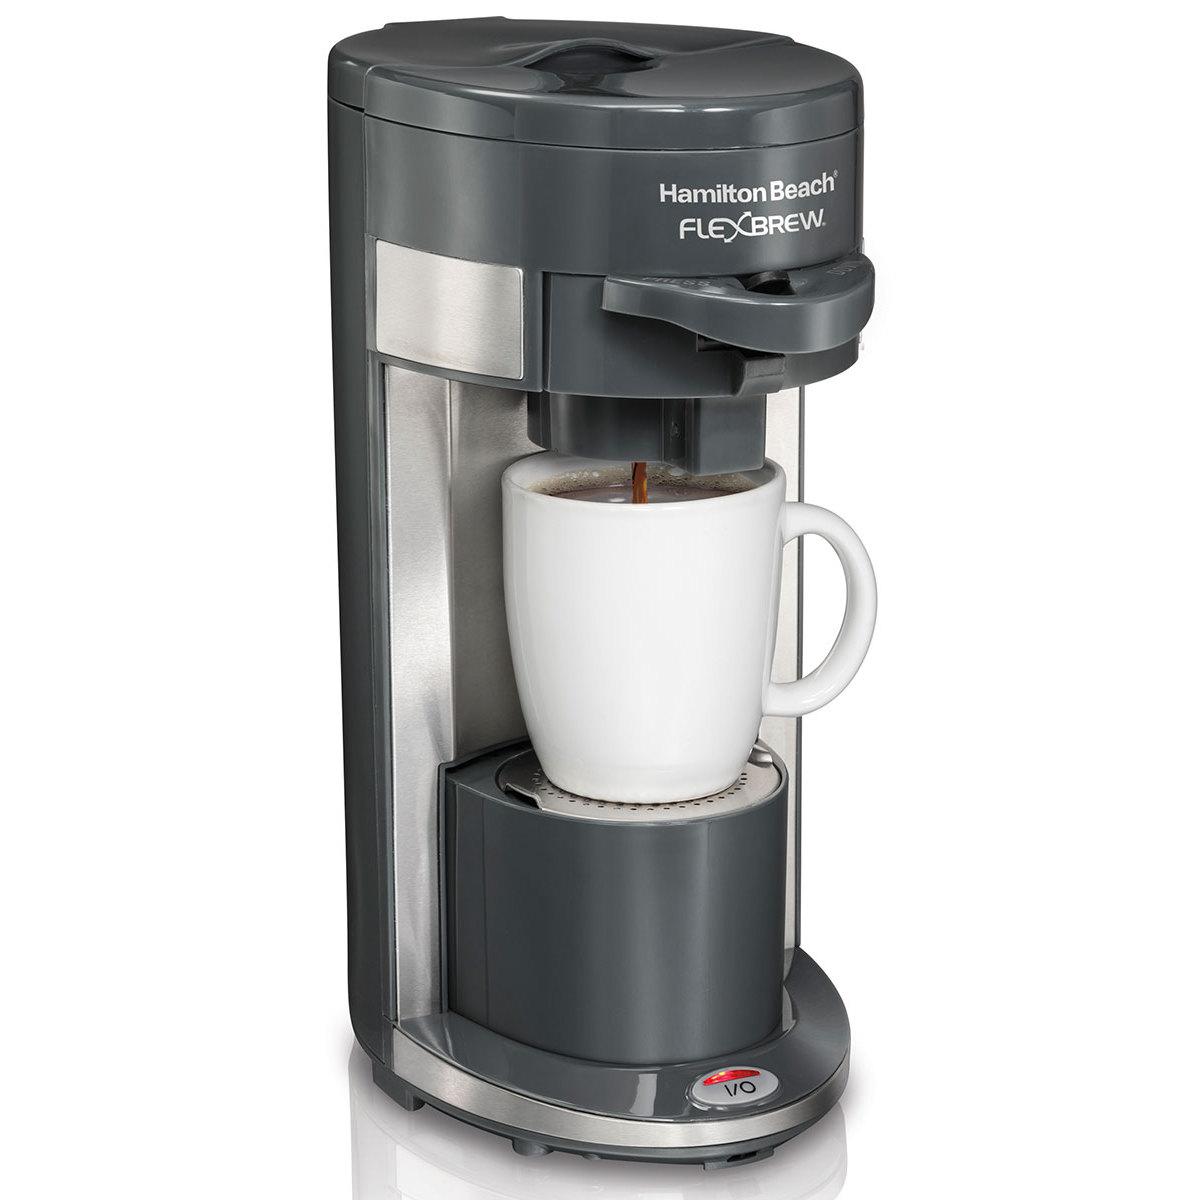 hamilton beach flexbrew coffee maker single serve gray 49963. Black Bedroom Furniture Sets. Home Design Ideas